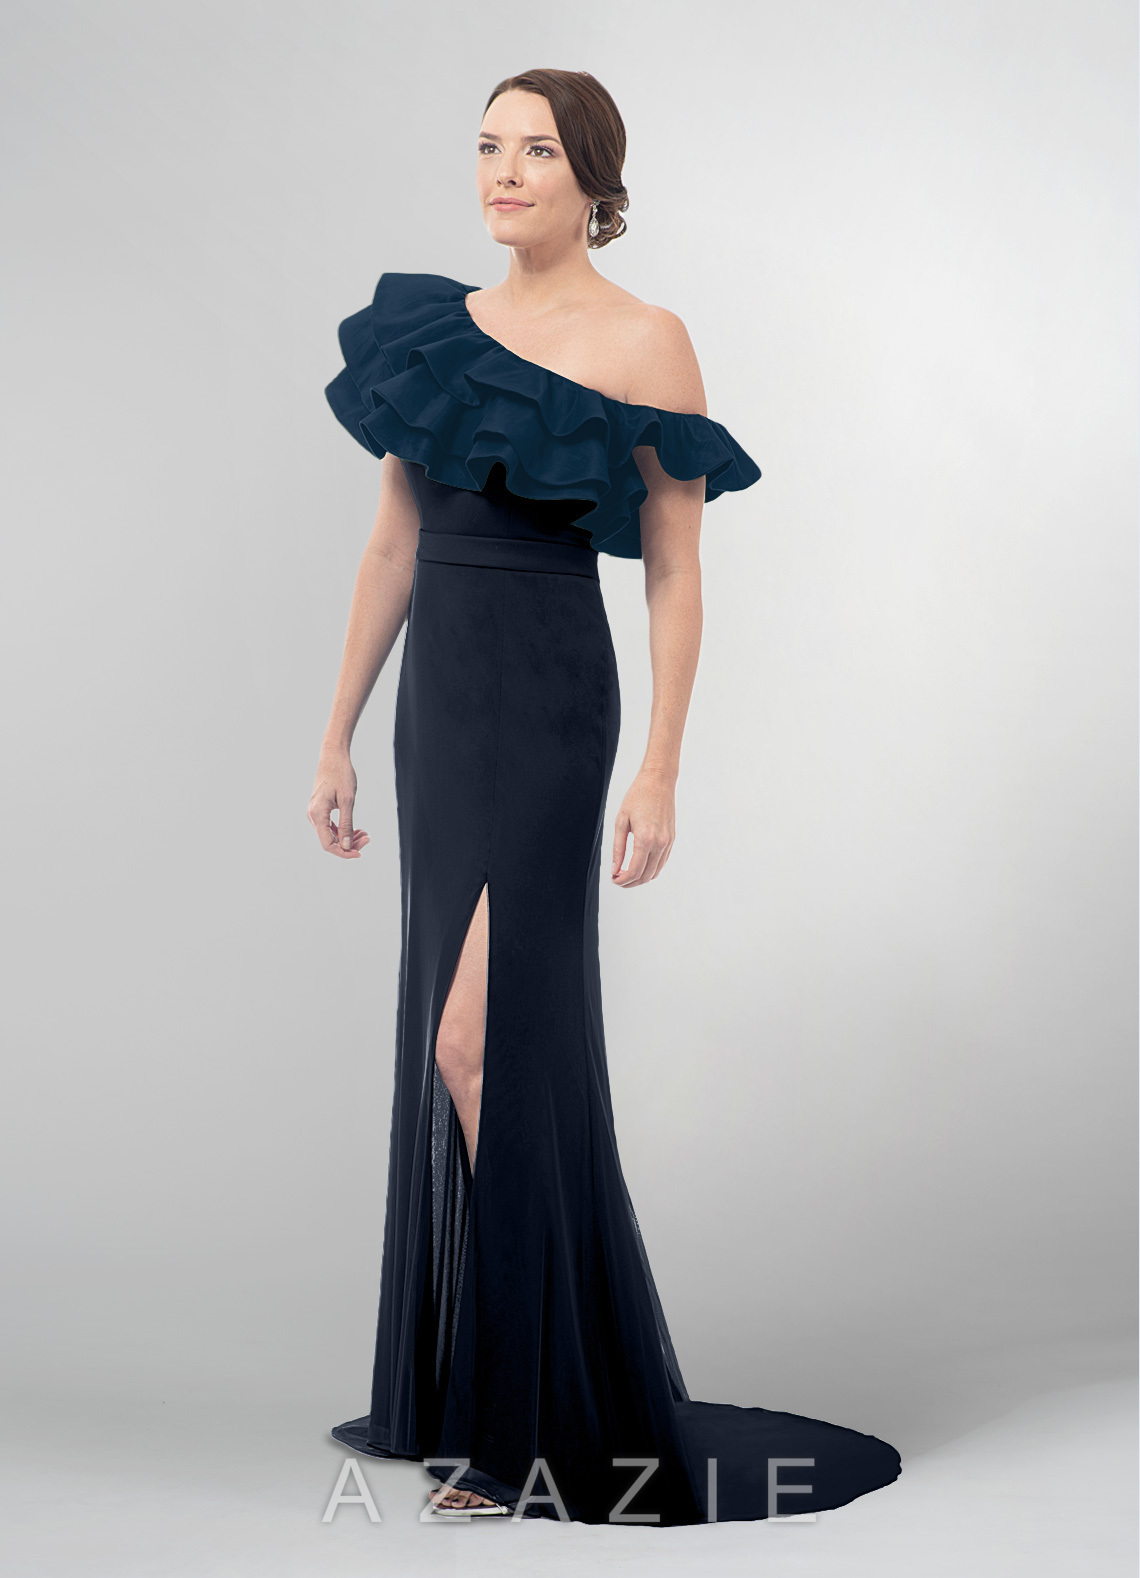 78e4b795ee Azazie Tallulah MBD Mother Of The Bride Dress